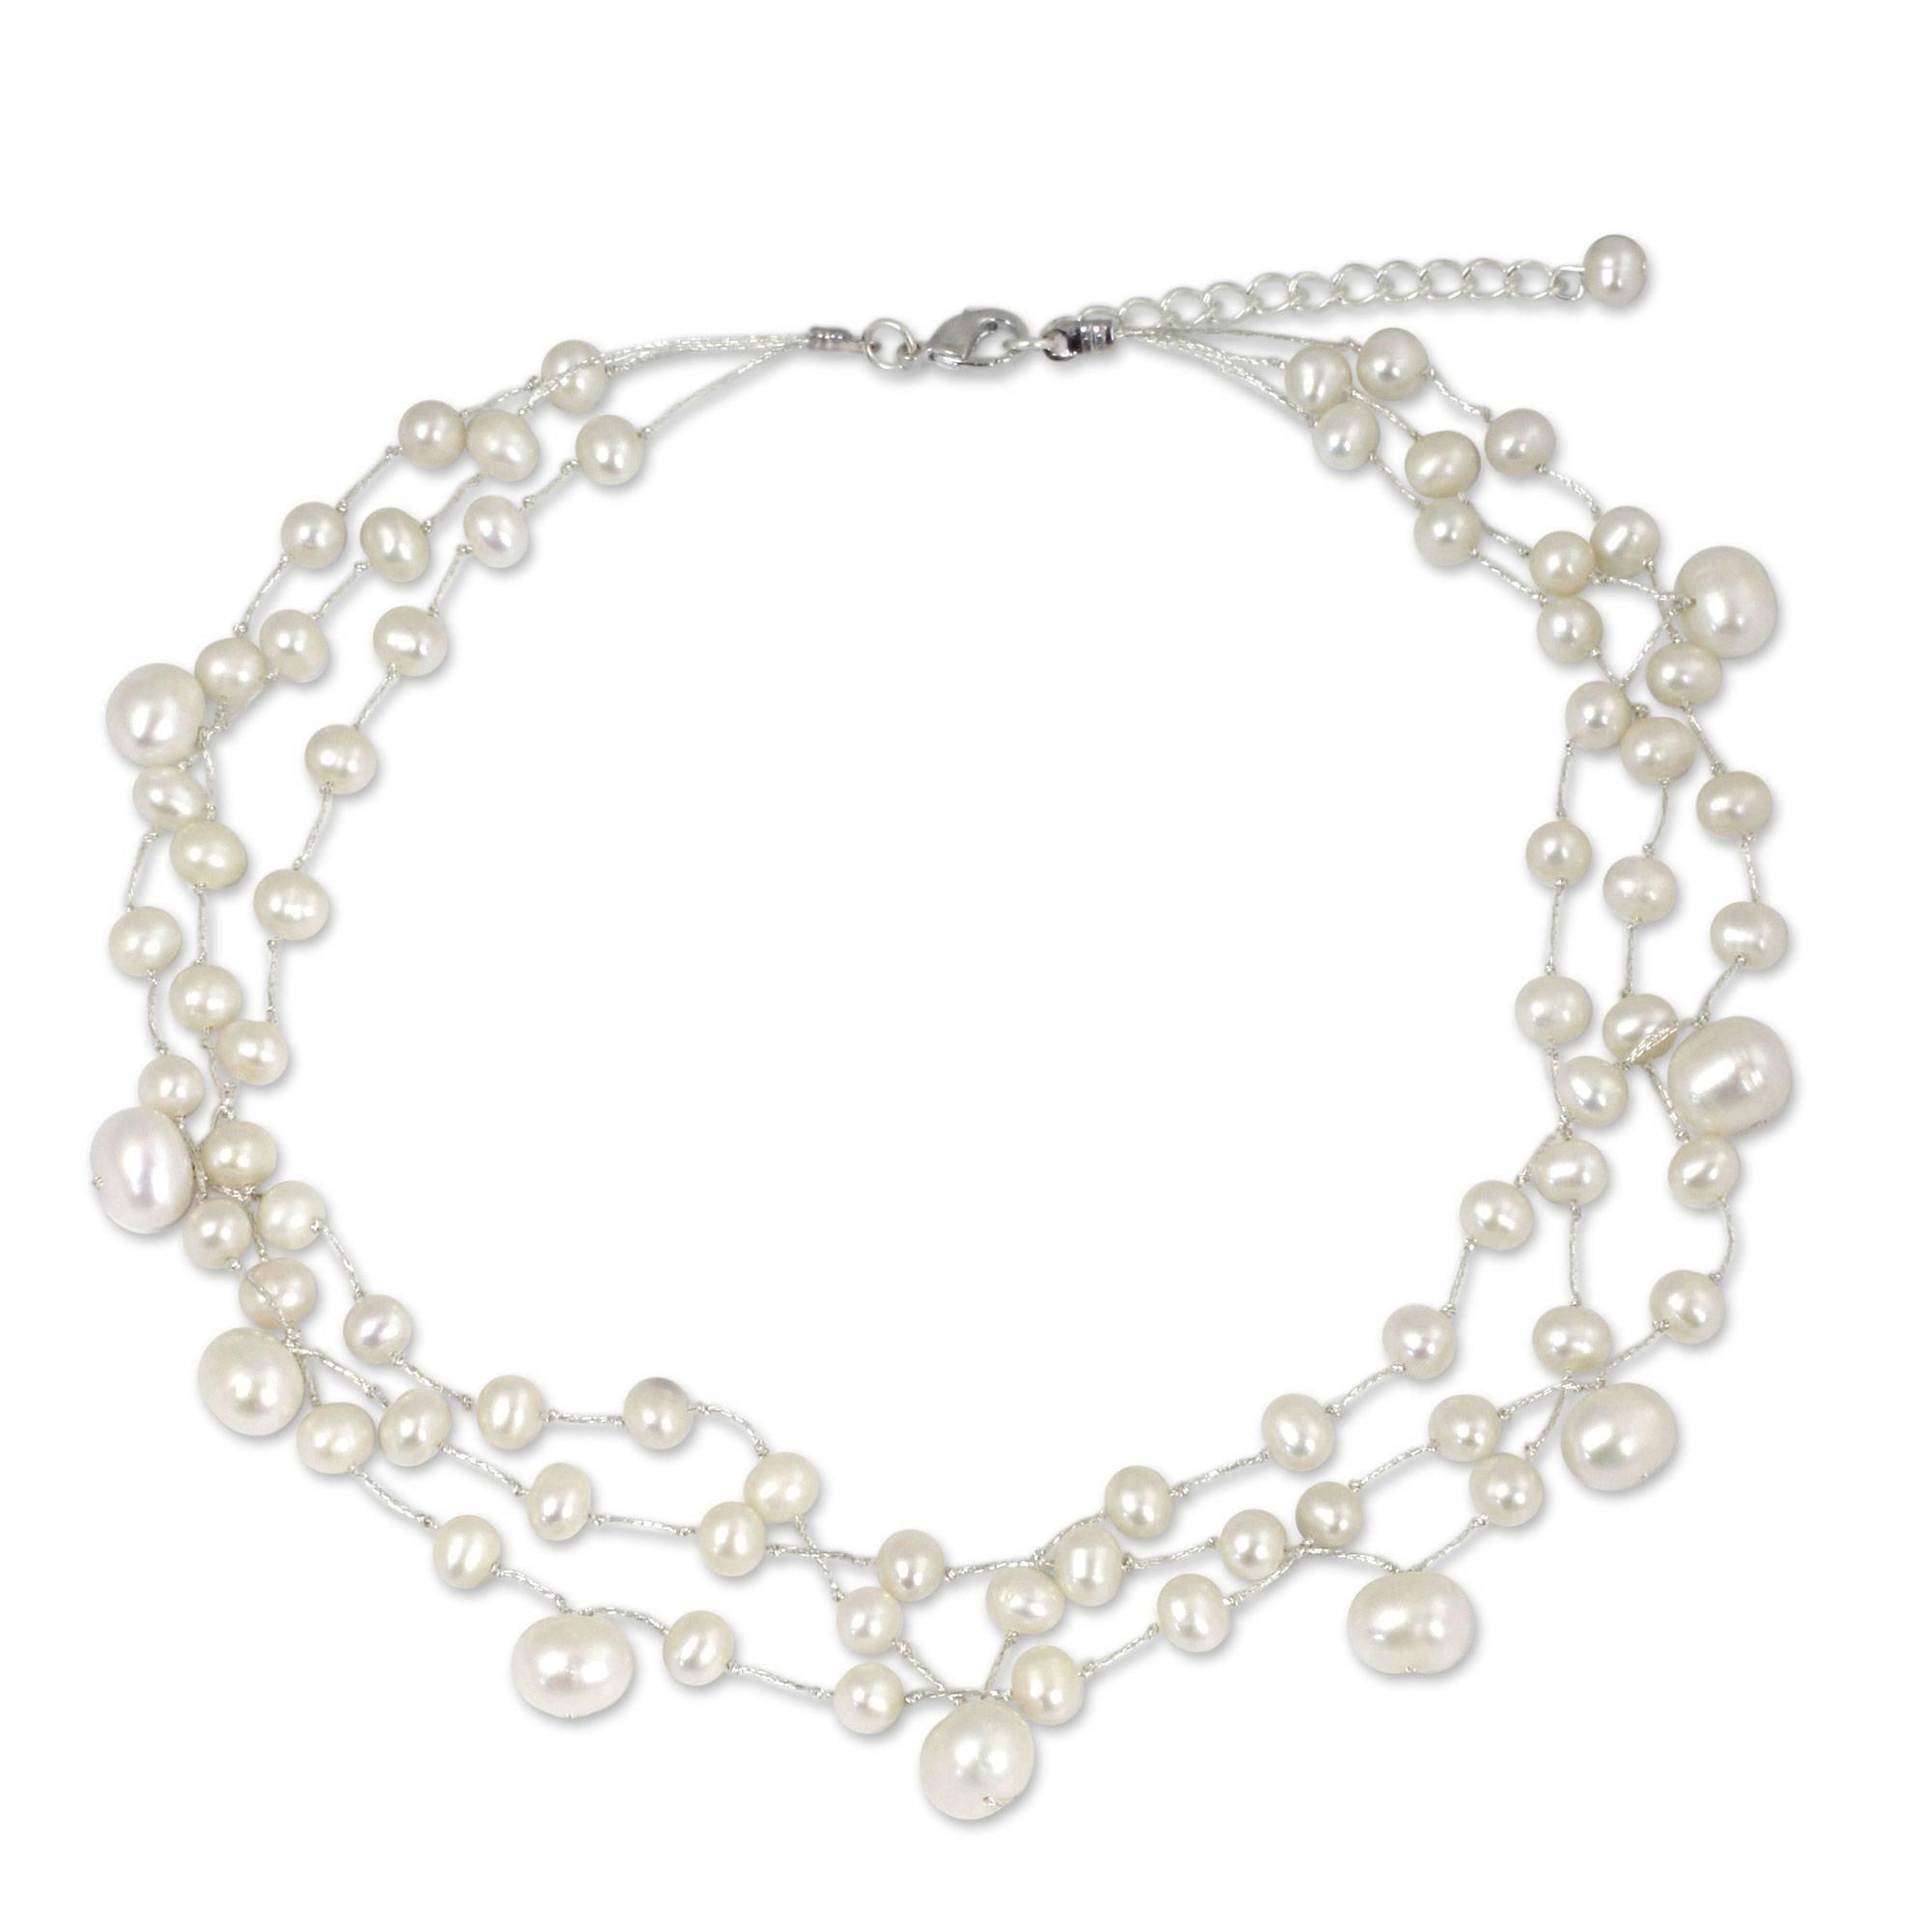 NOVICA White Cultured Freshwater Pearl Multi-Strand Bridal Choker, 15.5'' - 17.5'', Moonlight Glow'